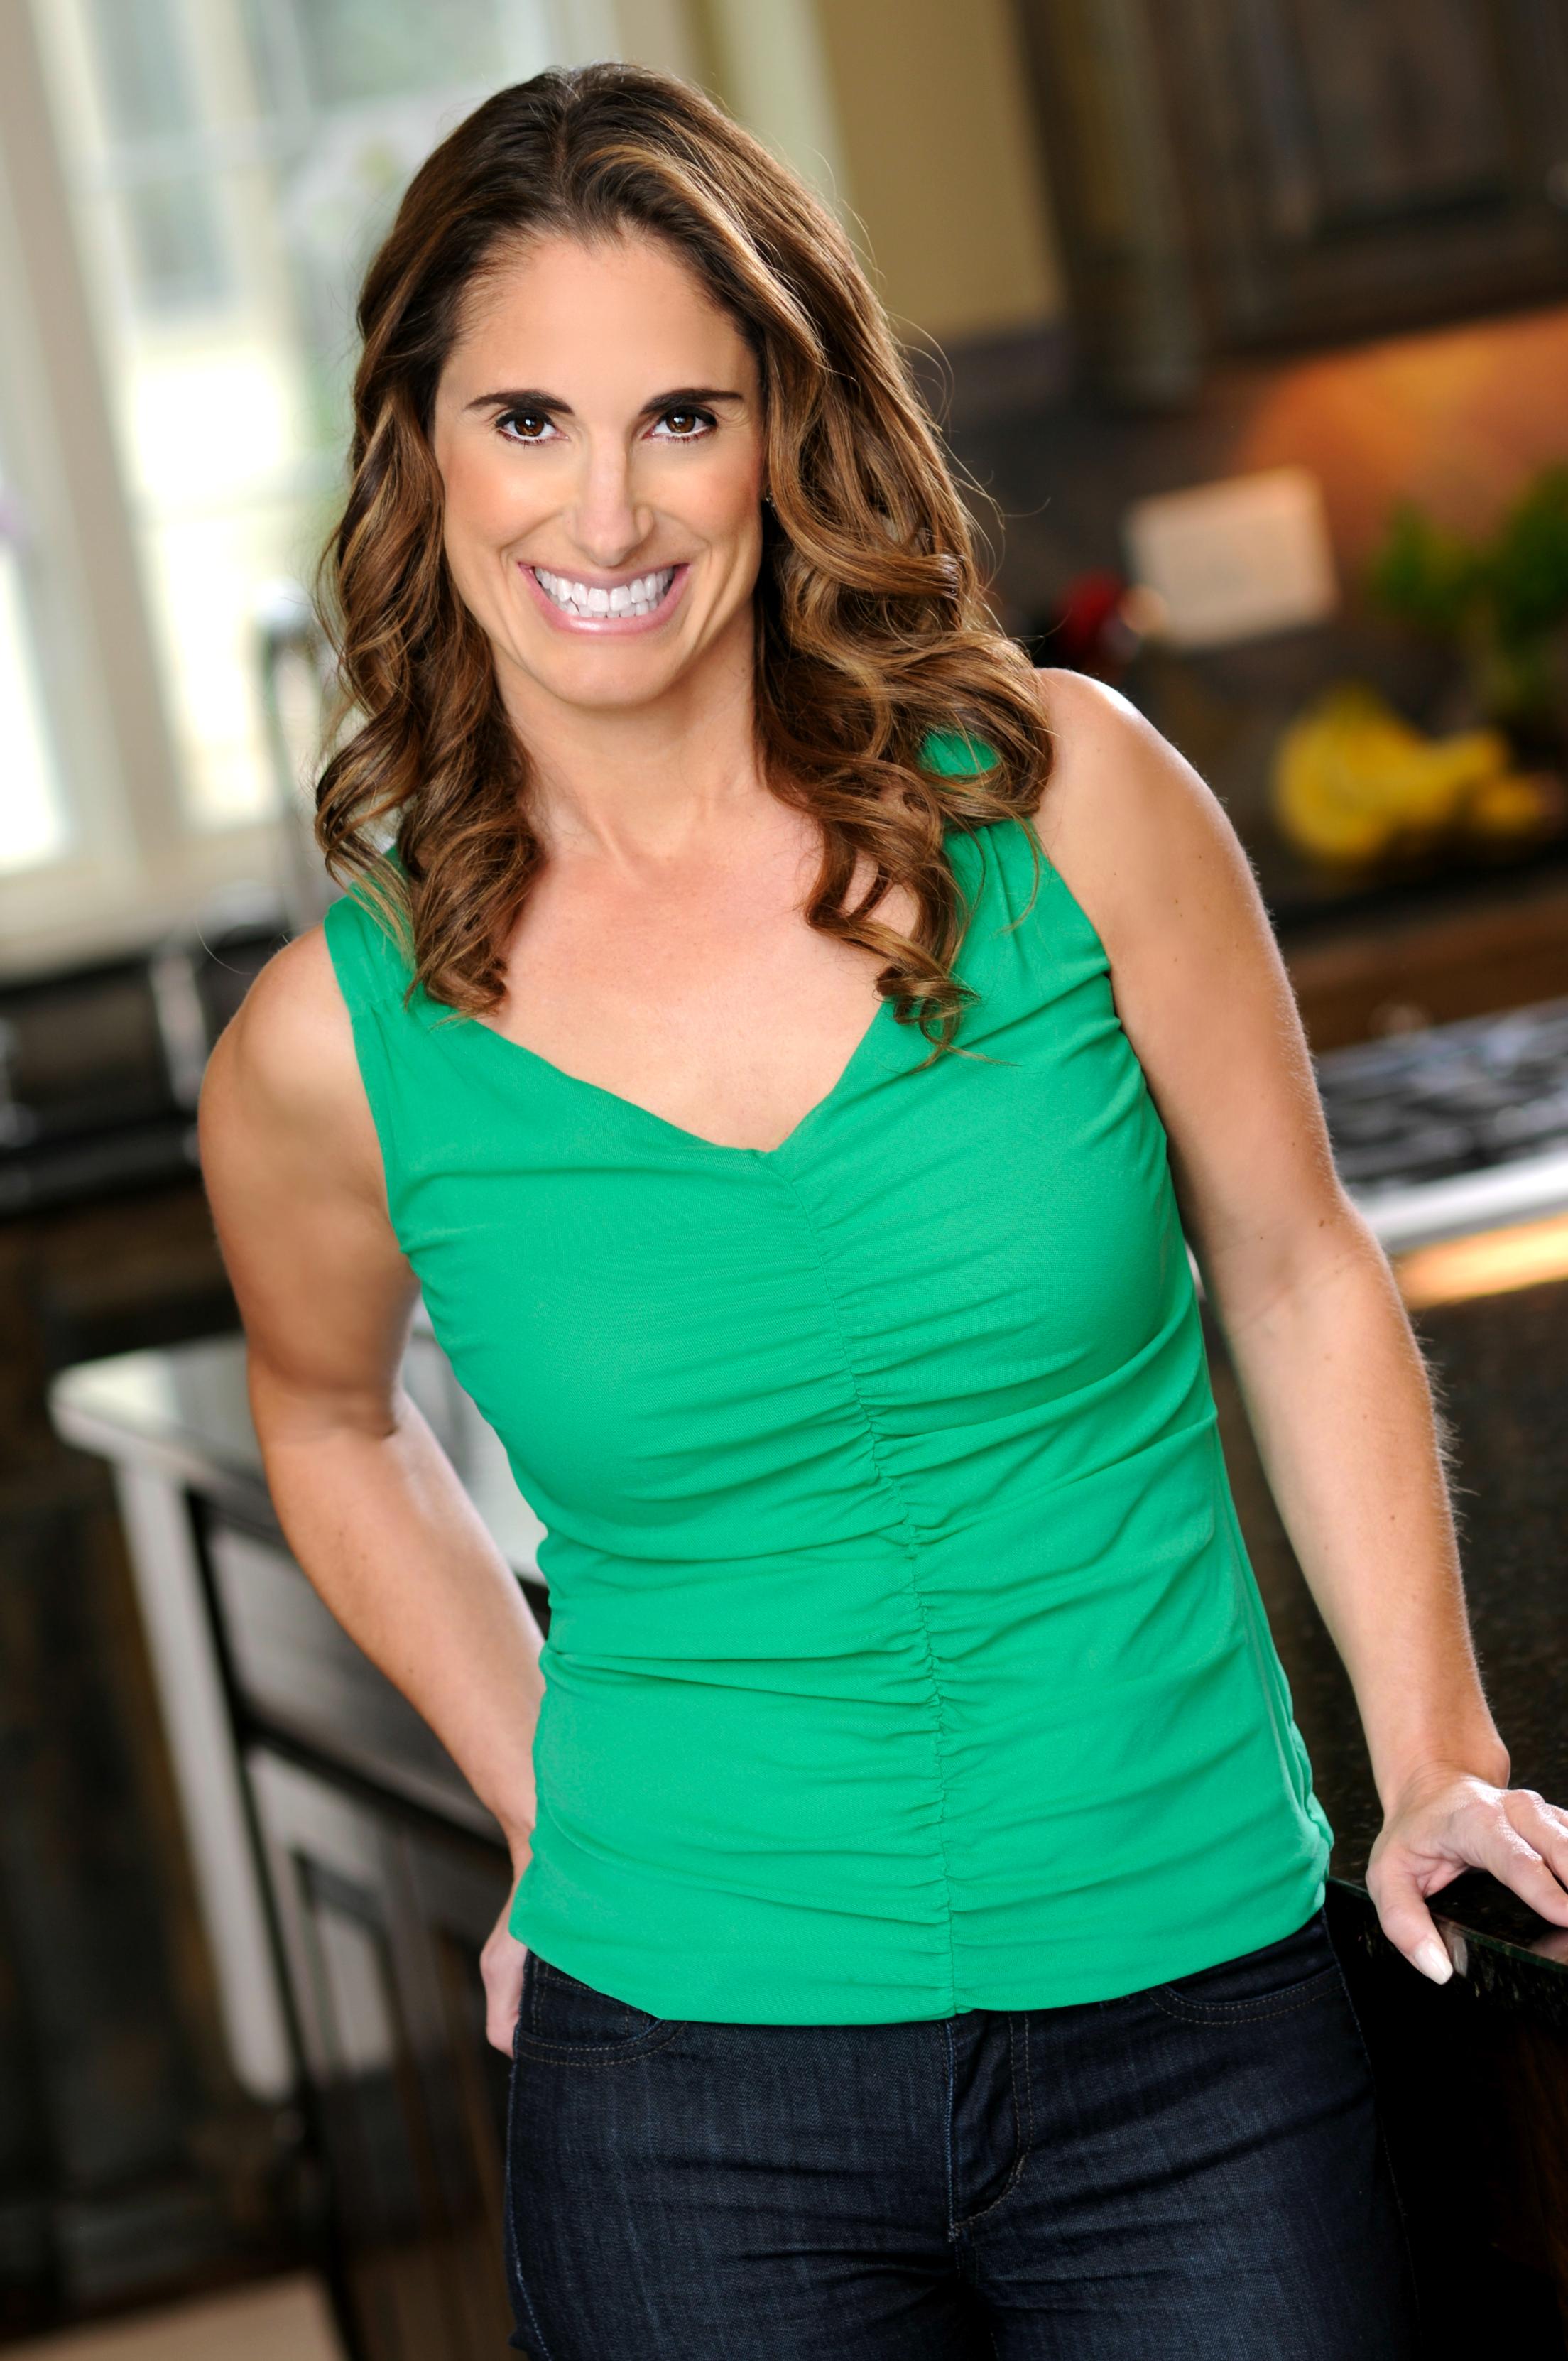 Mitzi Dulan, Founder, simplyFUEL - Pinterest profile: Mitzi Dulan—America's Nutrition Expert